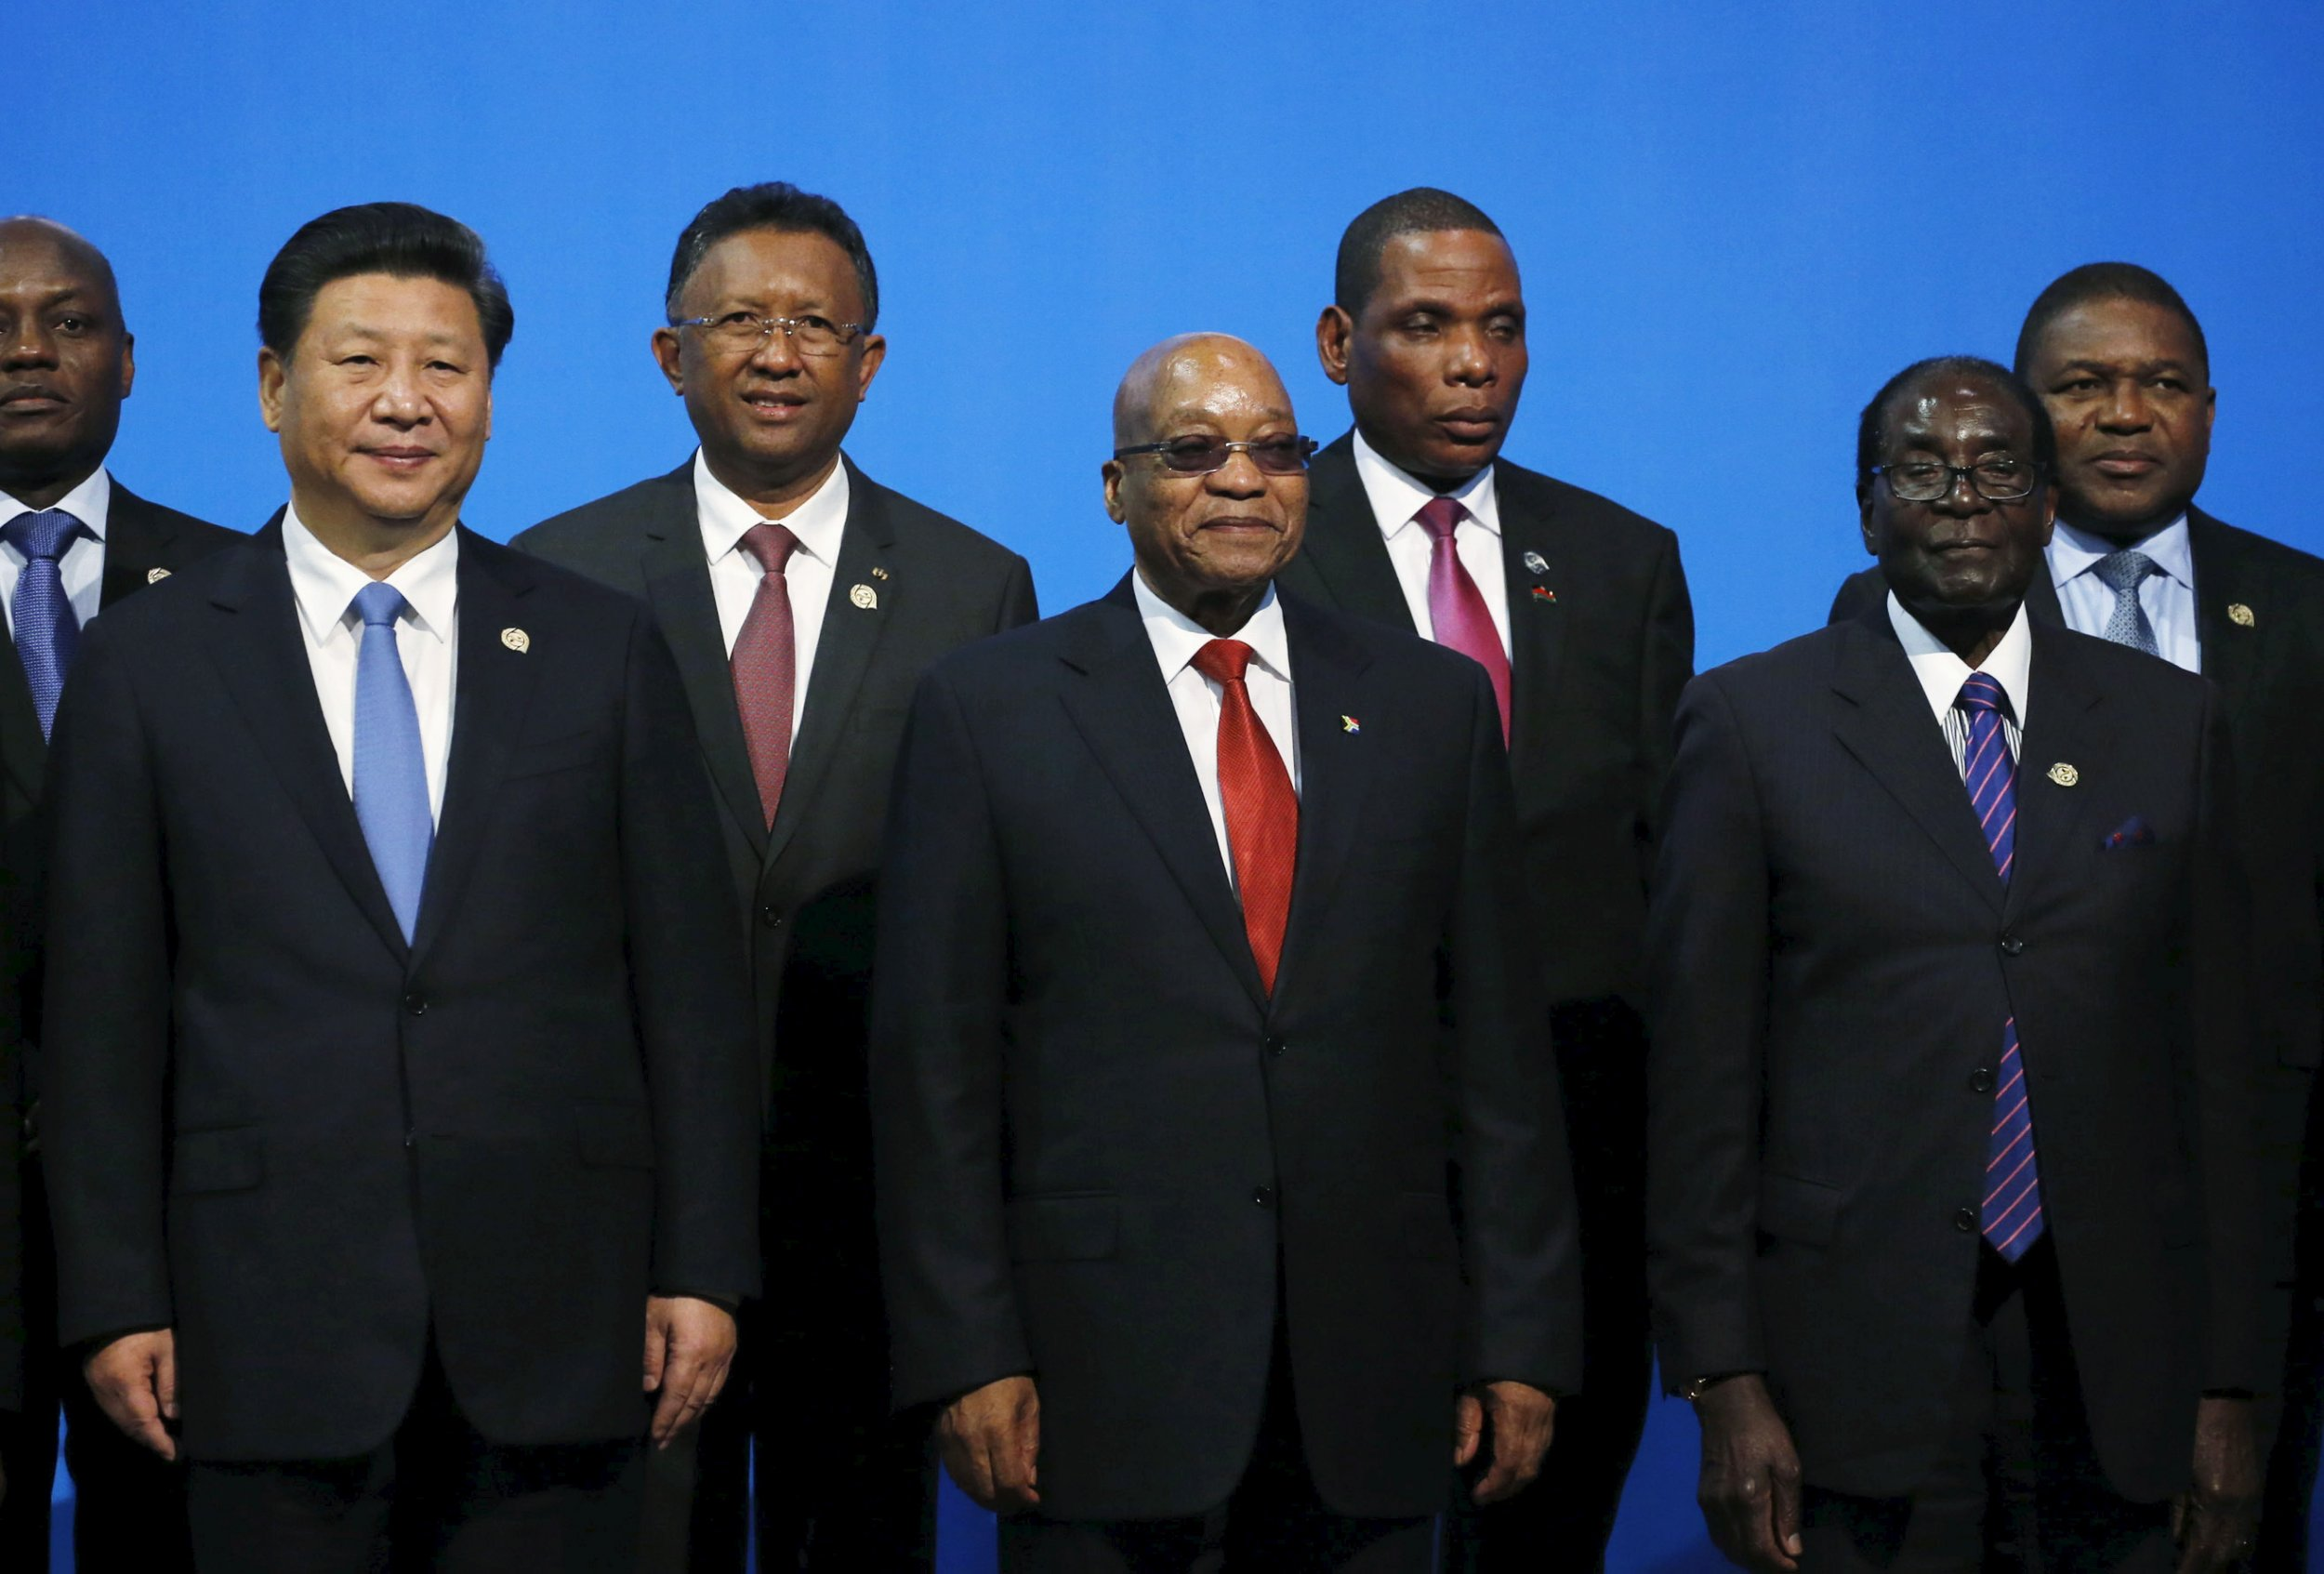 China's Xi Jinping poses with Robert Mugabe and Jacob Zuma.